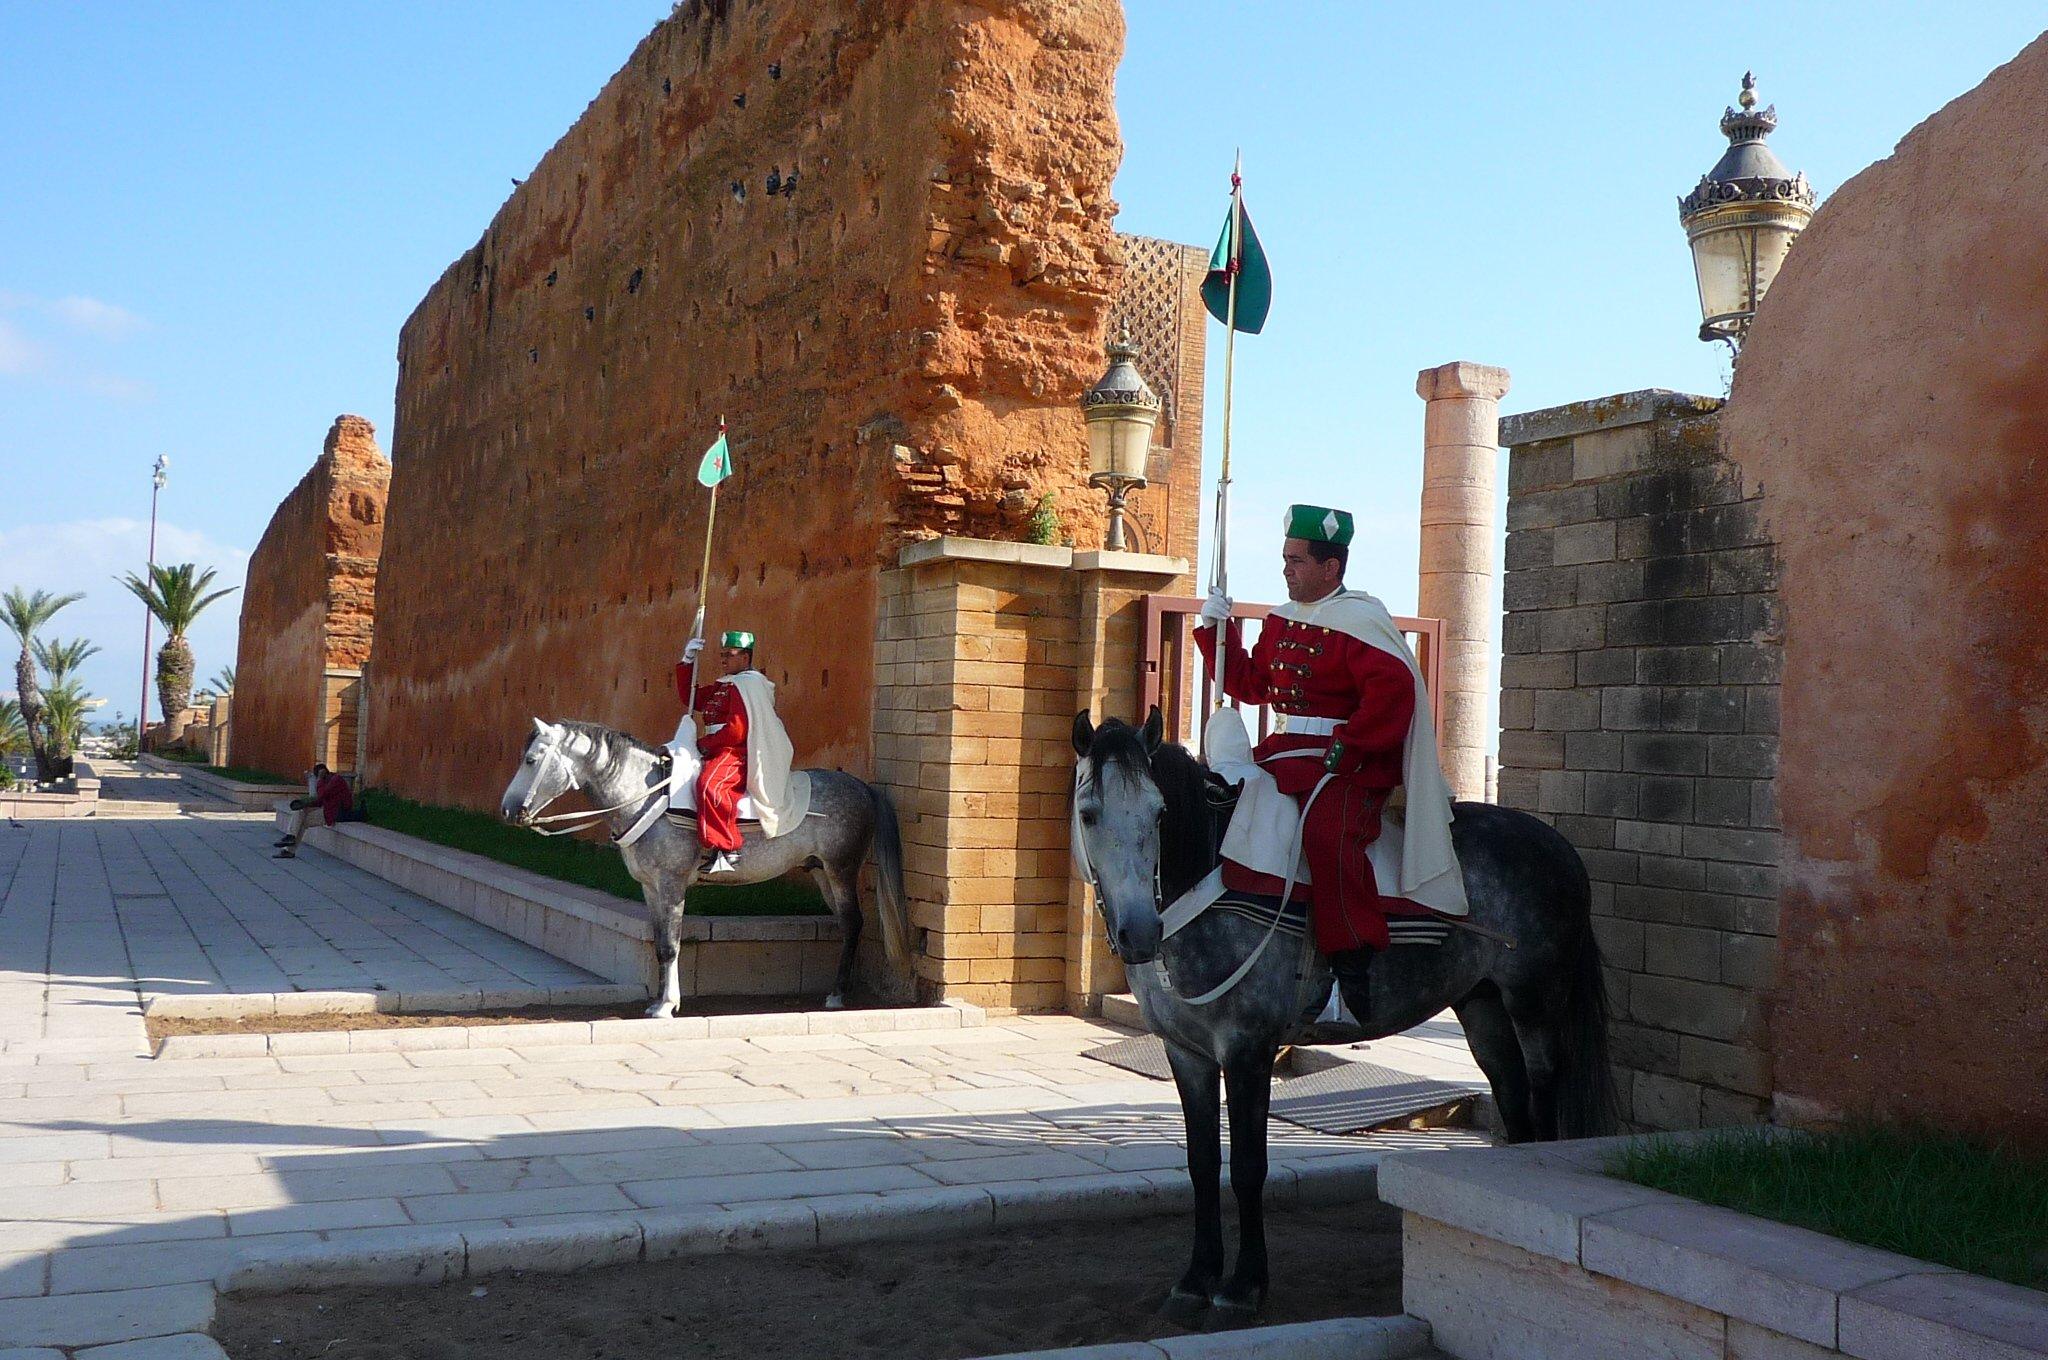 https://www.caravan-serai.com/wp-content/uploads/2016/08/TunisMoroc-861.jpg